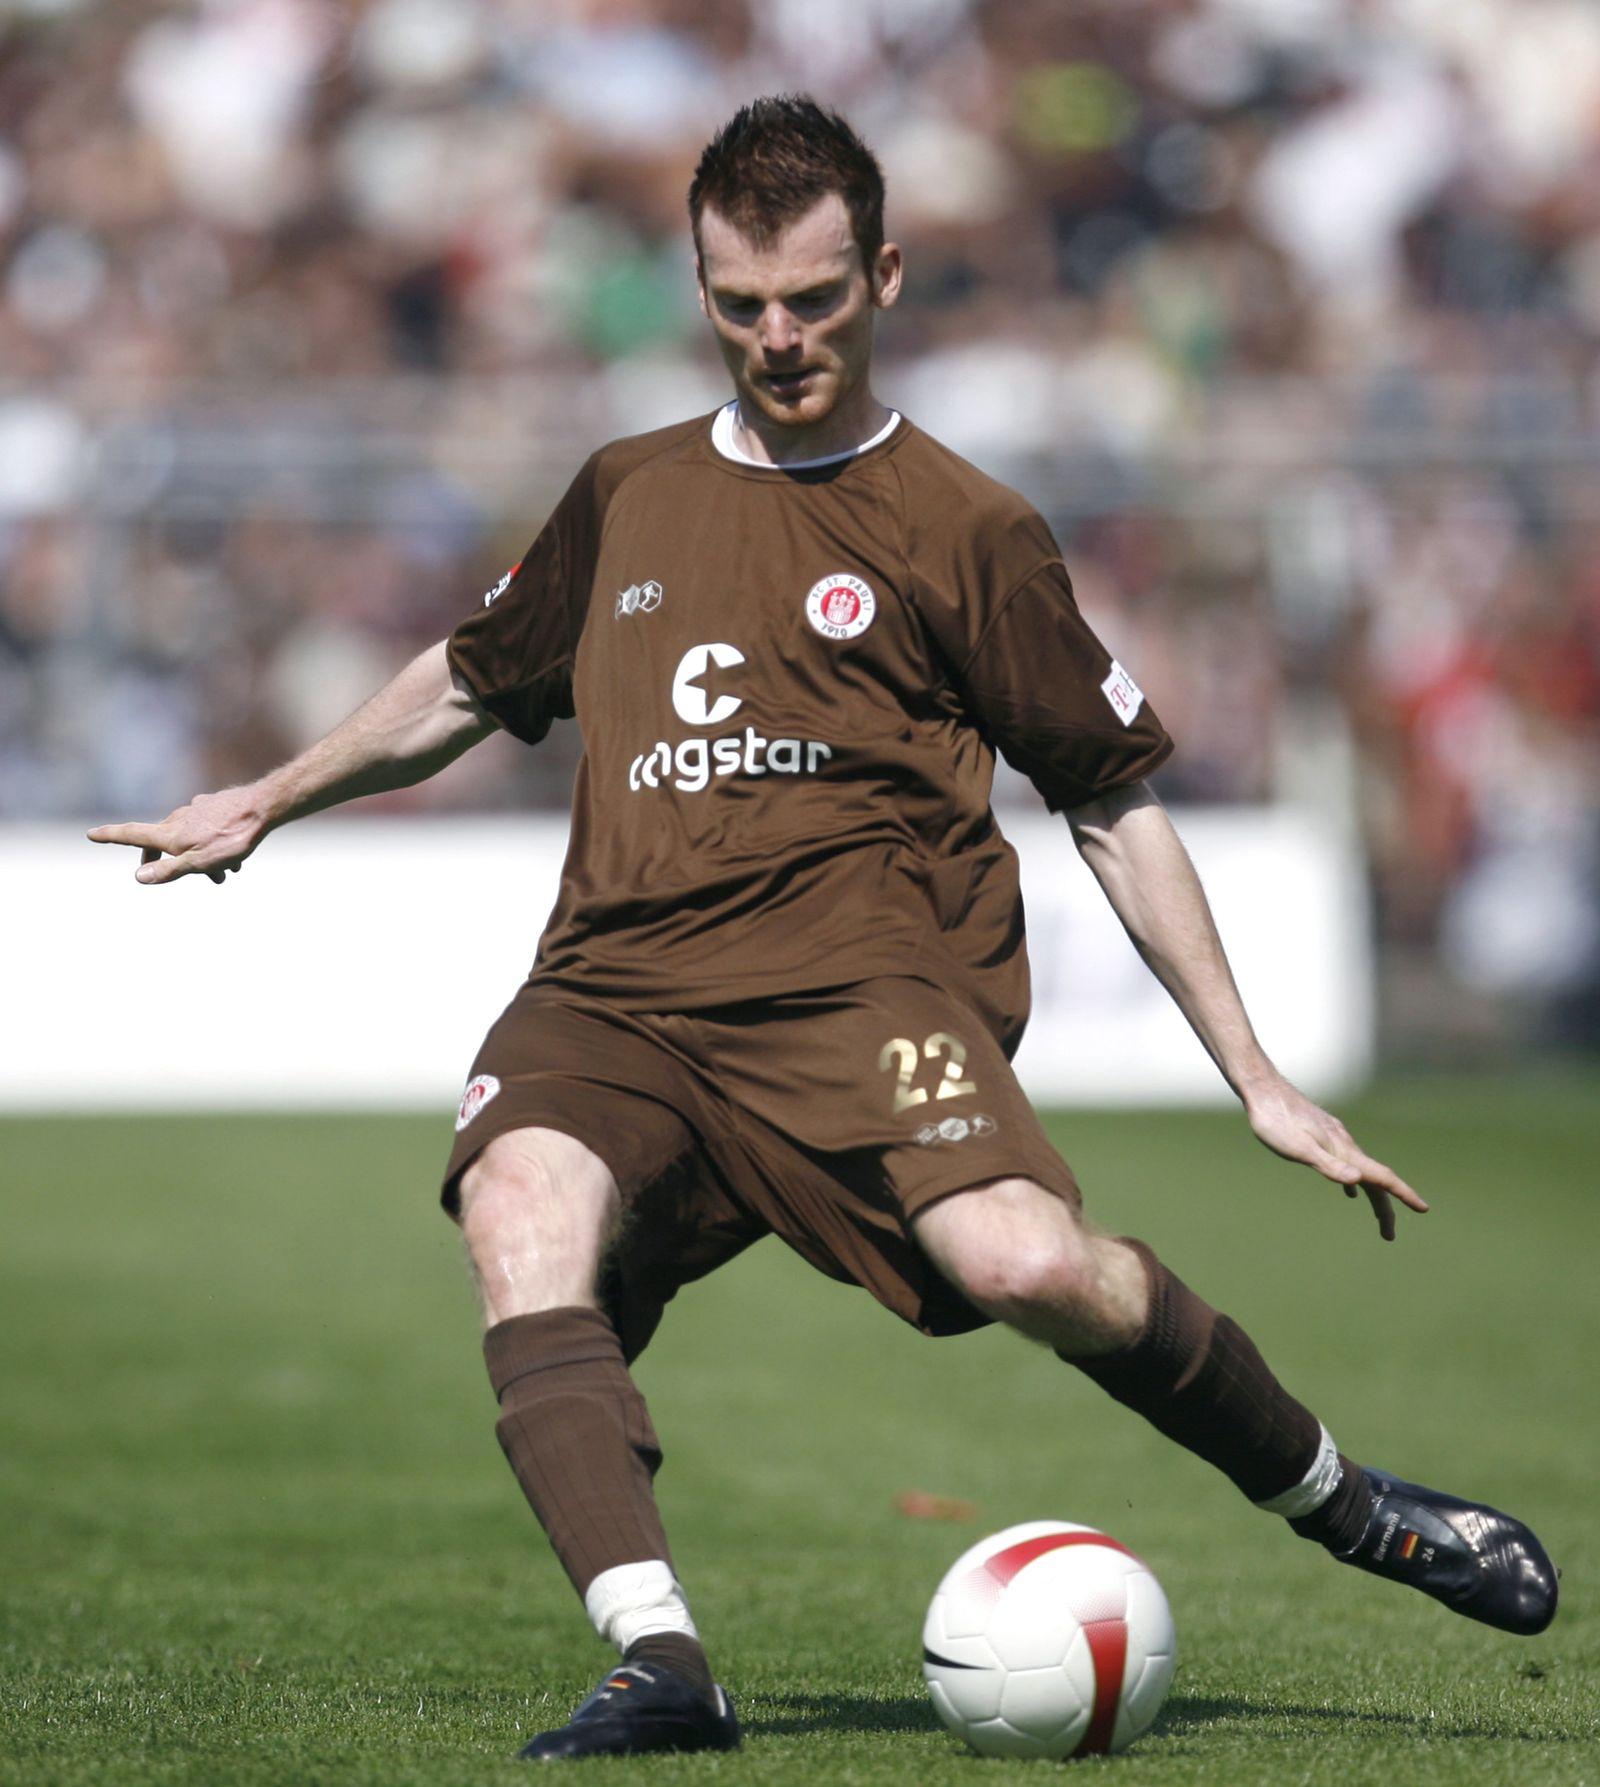 Andreas Biermann / FC St. Pauli